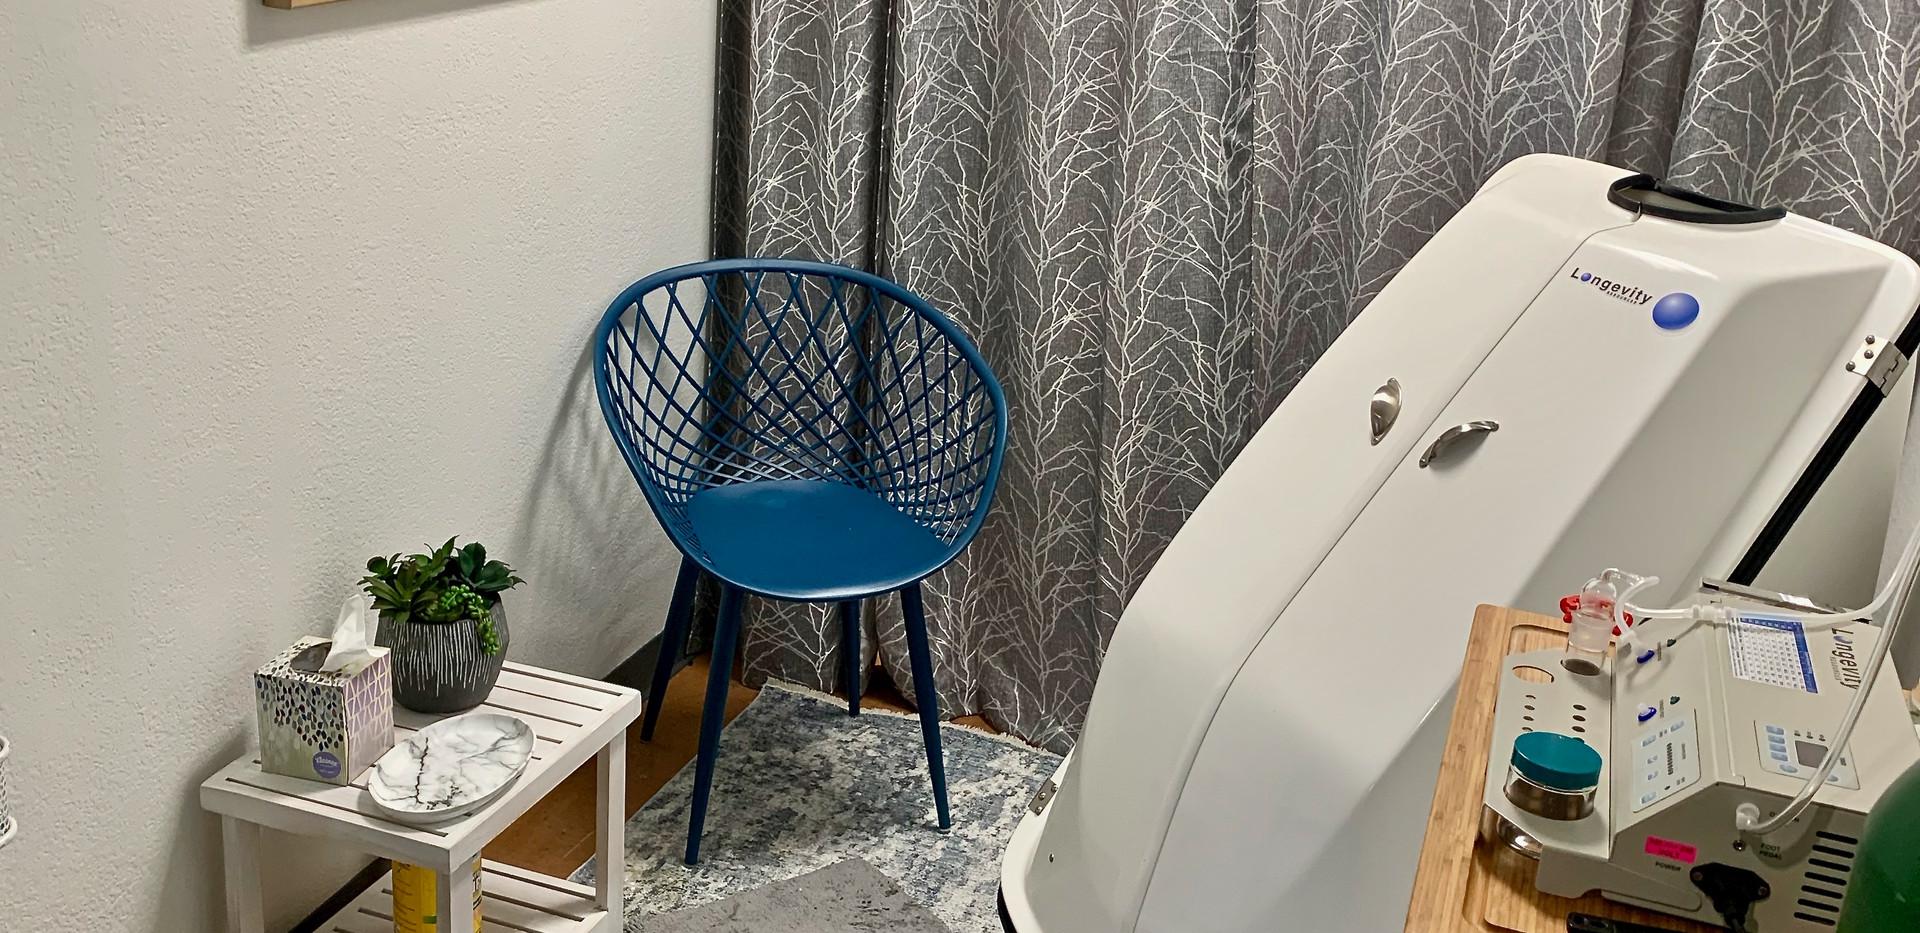 central-dentist-ozone-sauna-room.jpeg